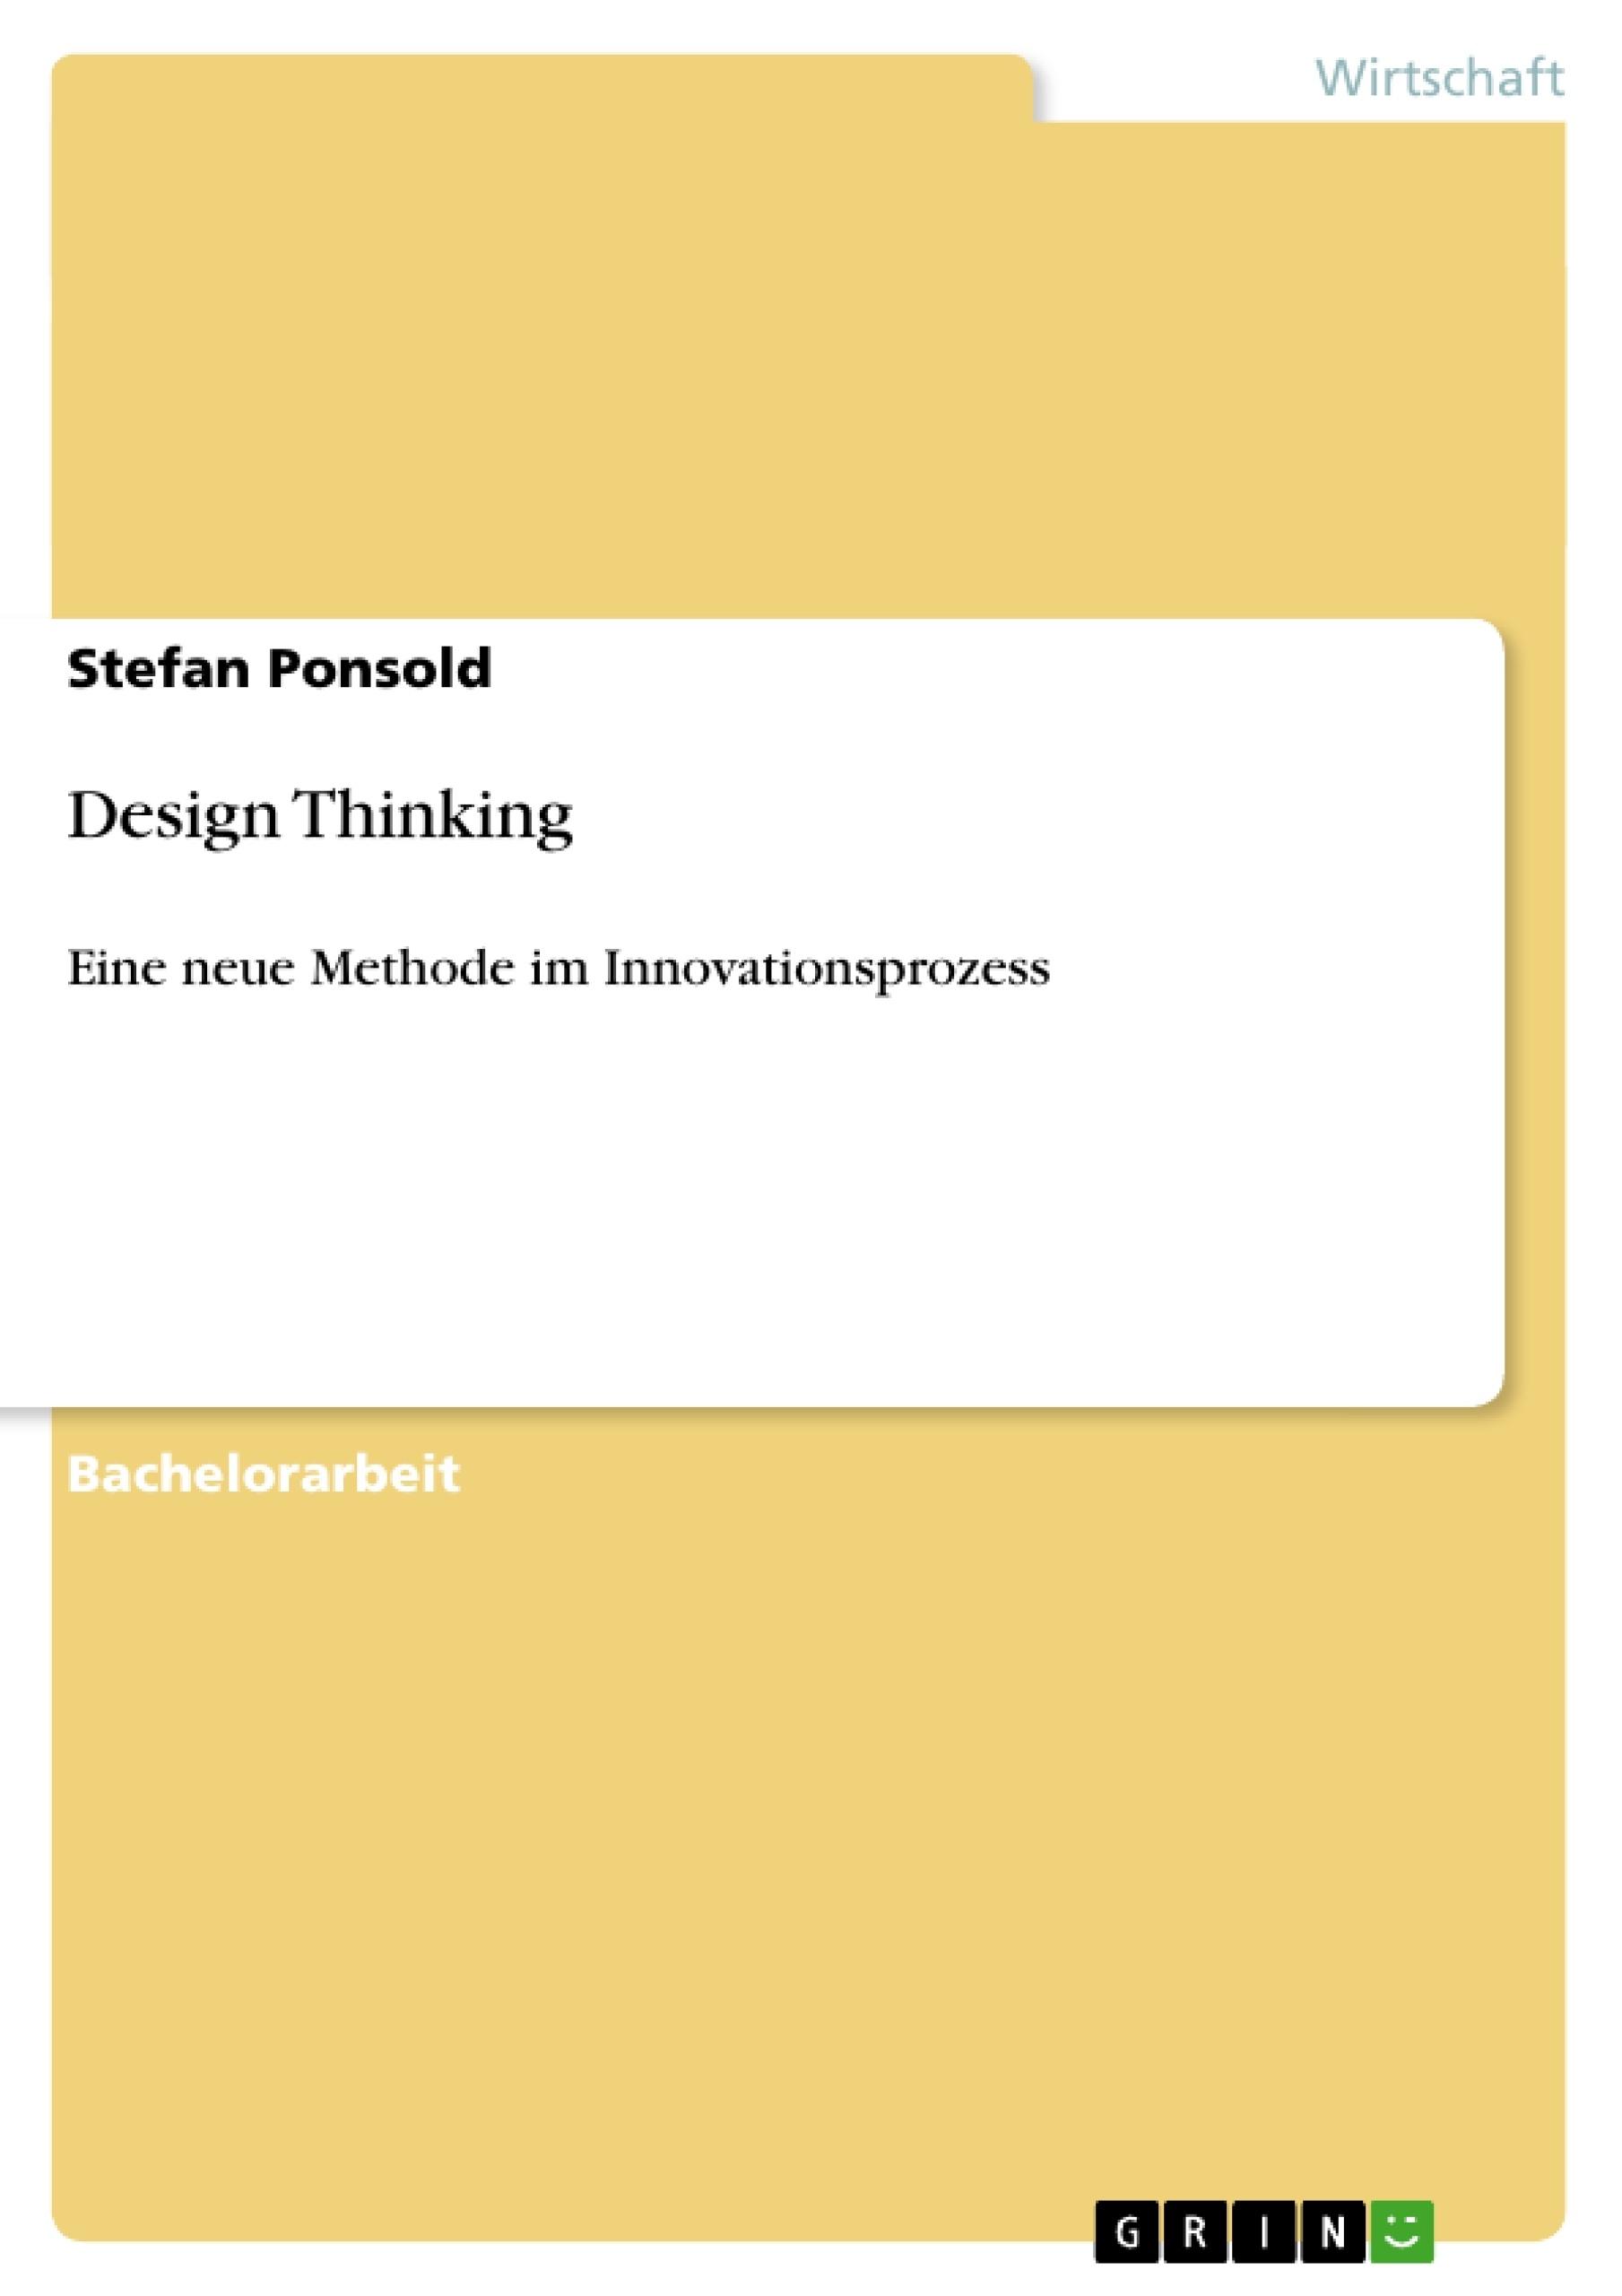 Titel: Design Thinking